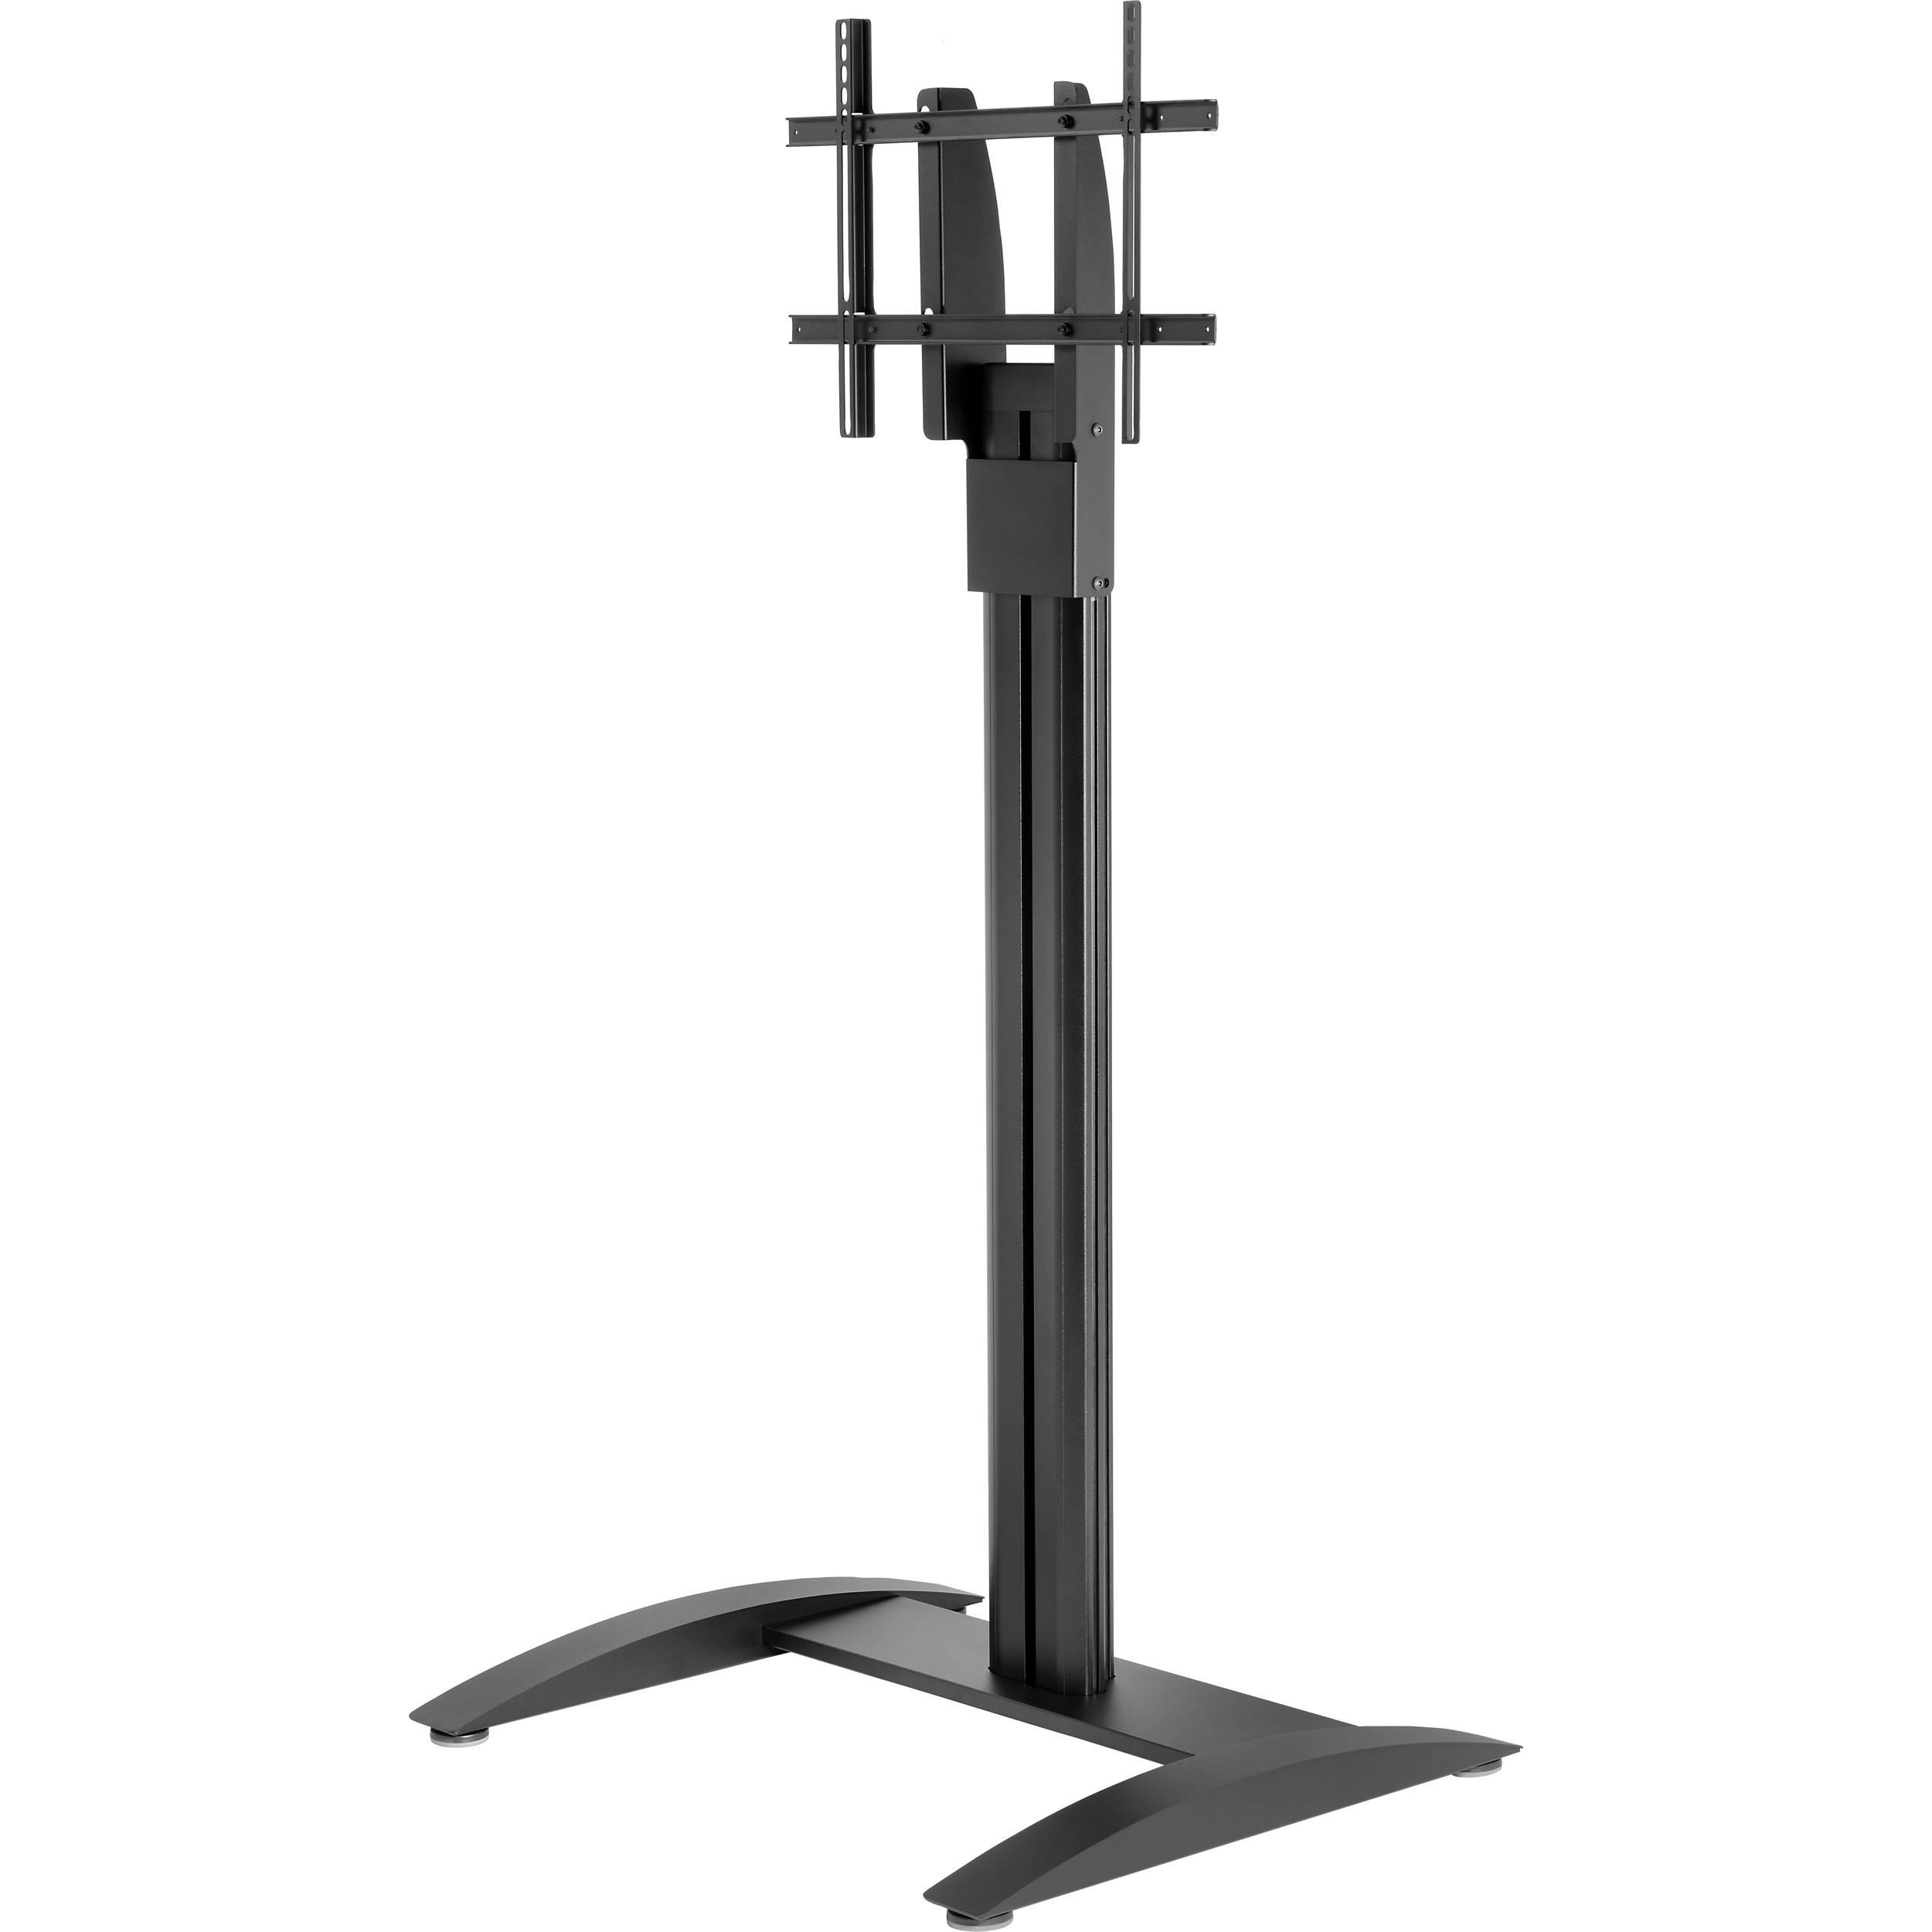 Peerless Av Smartmount Flat Panel Floor Stand Ss560f New B Amp H